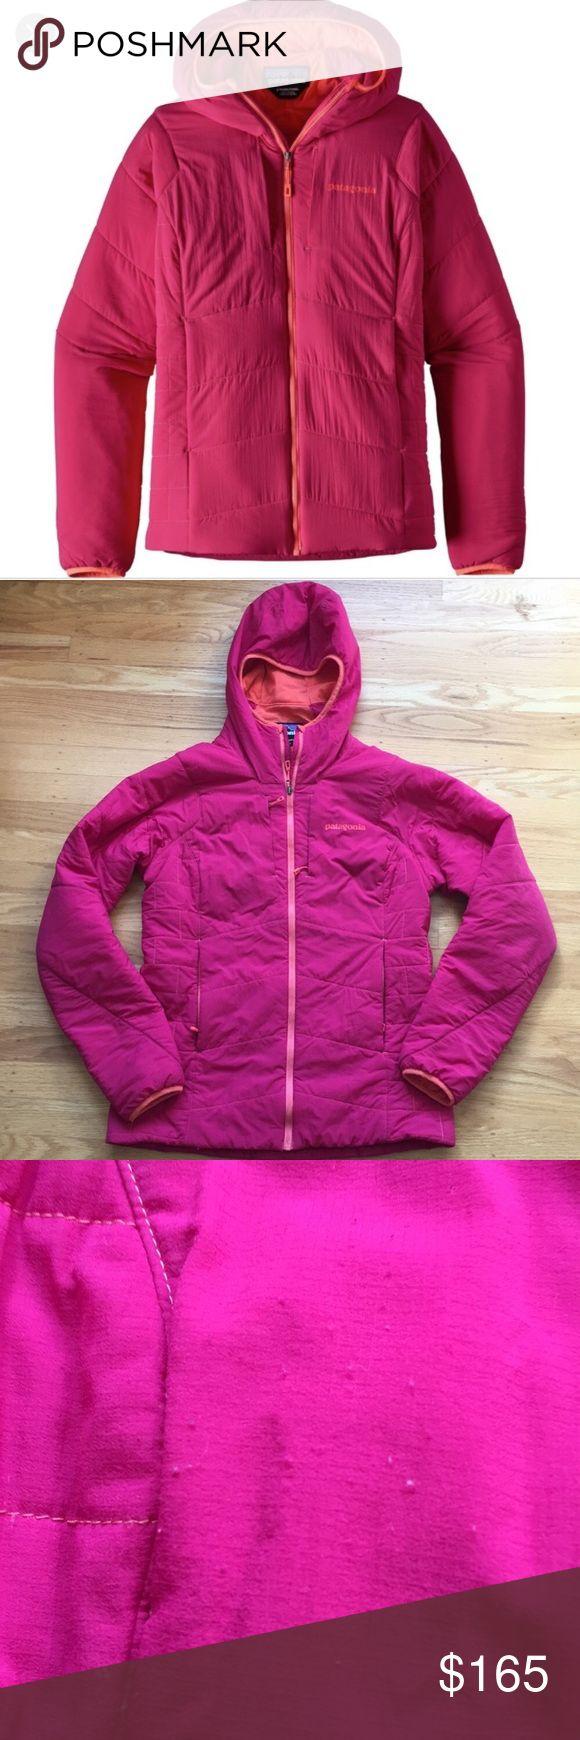 Patagonia Nano Air Hoody Jackets for women, Patagonia